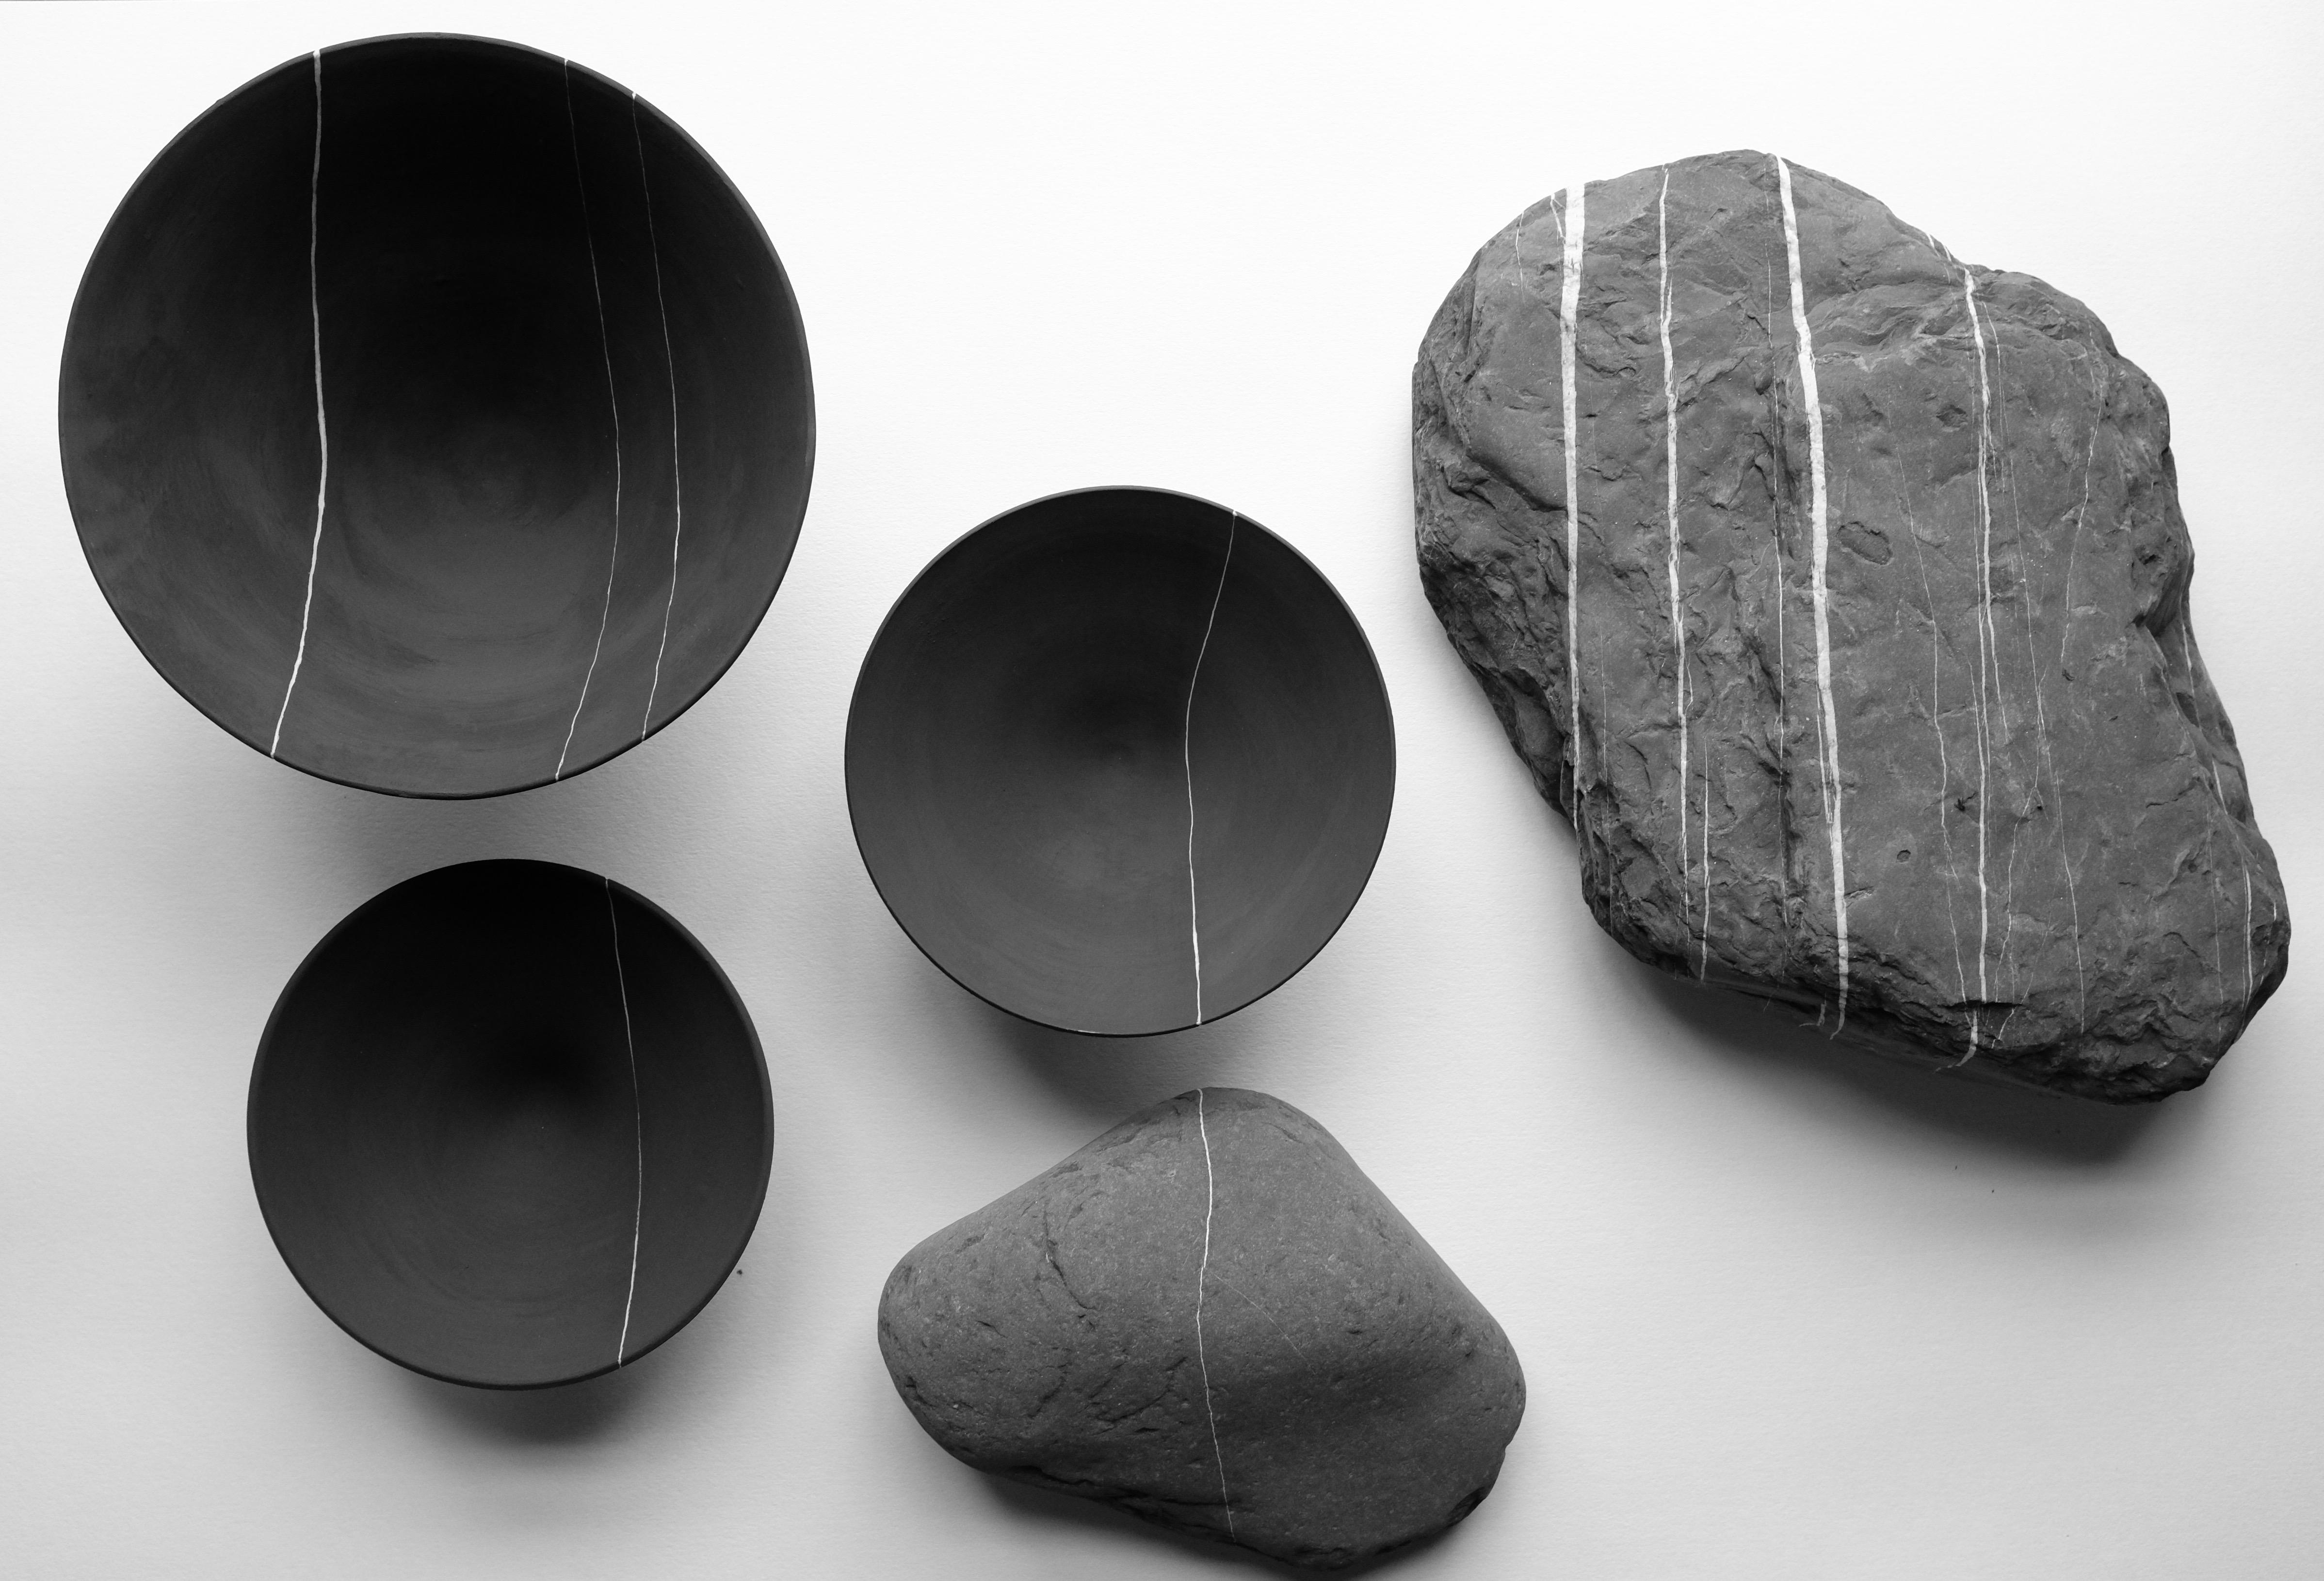 Strata bowls and stones